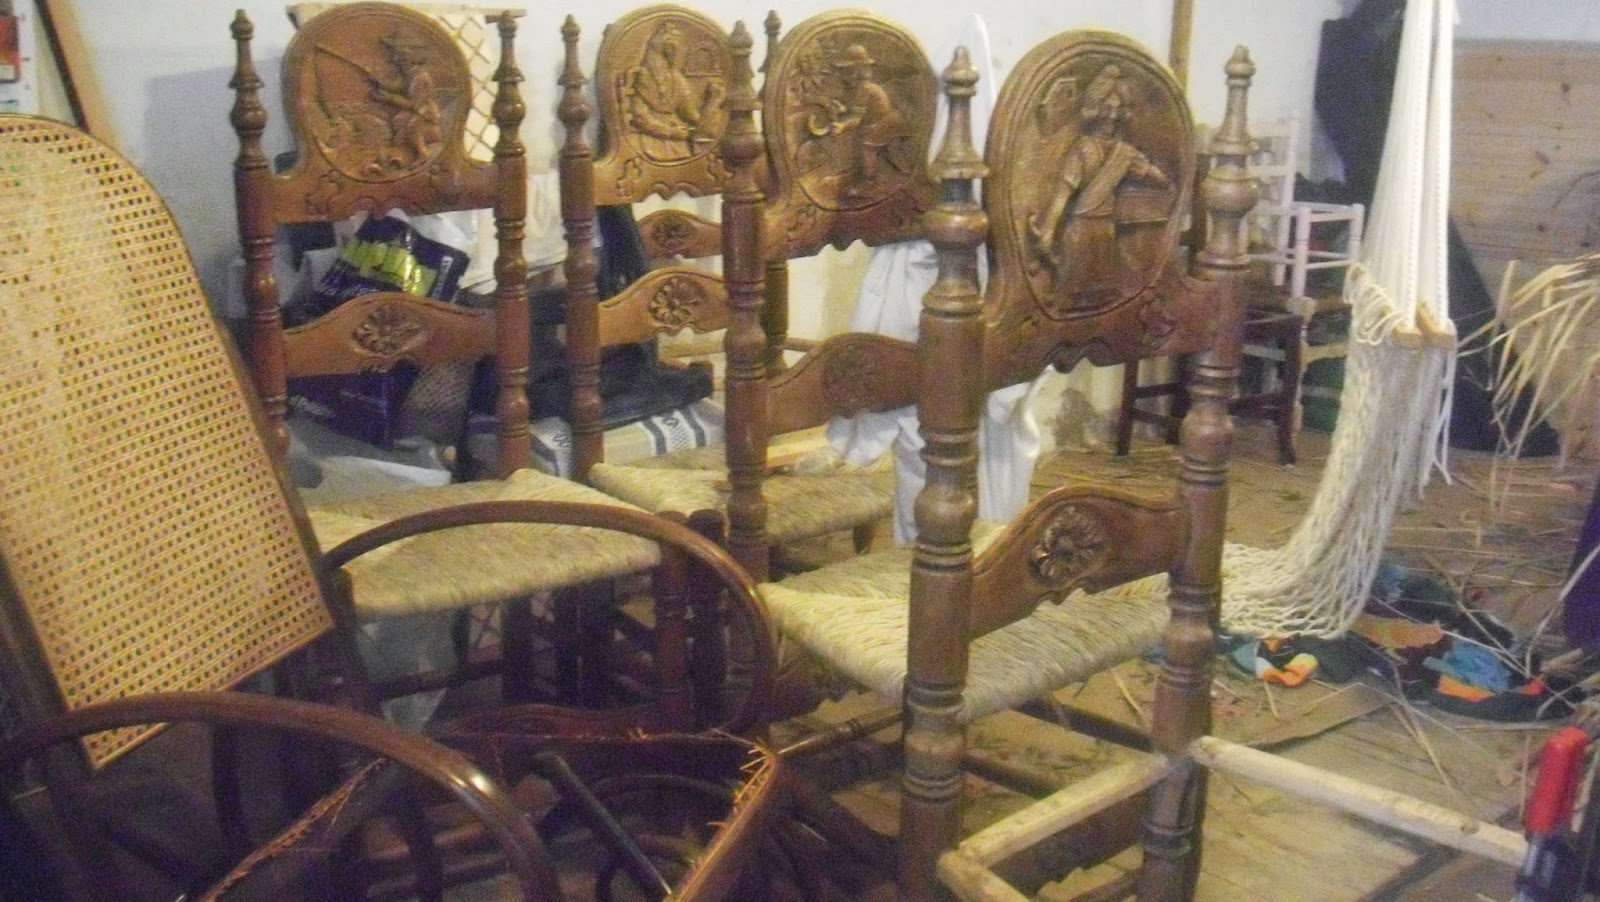 Reparaci de cadires amb boga reparaci n de sillas en - Reparacion de sillas de rejilla ...